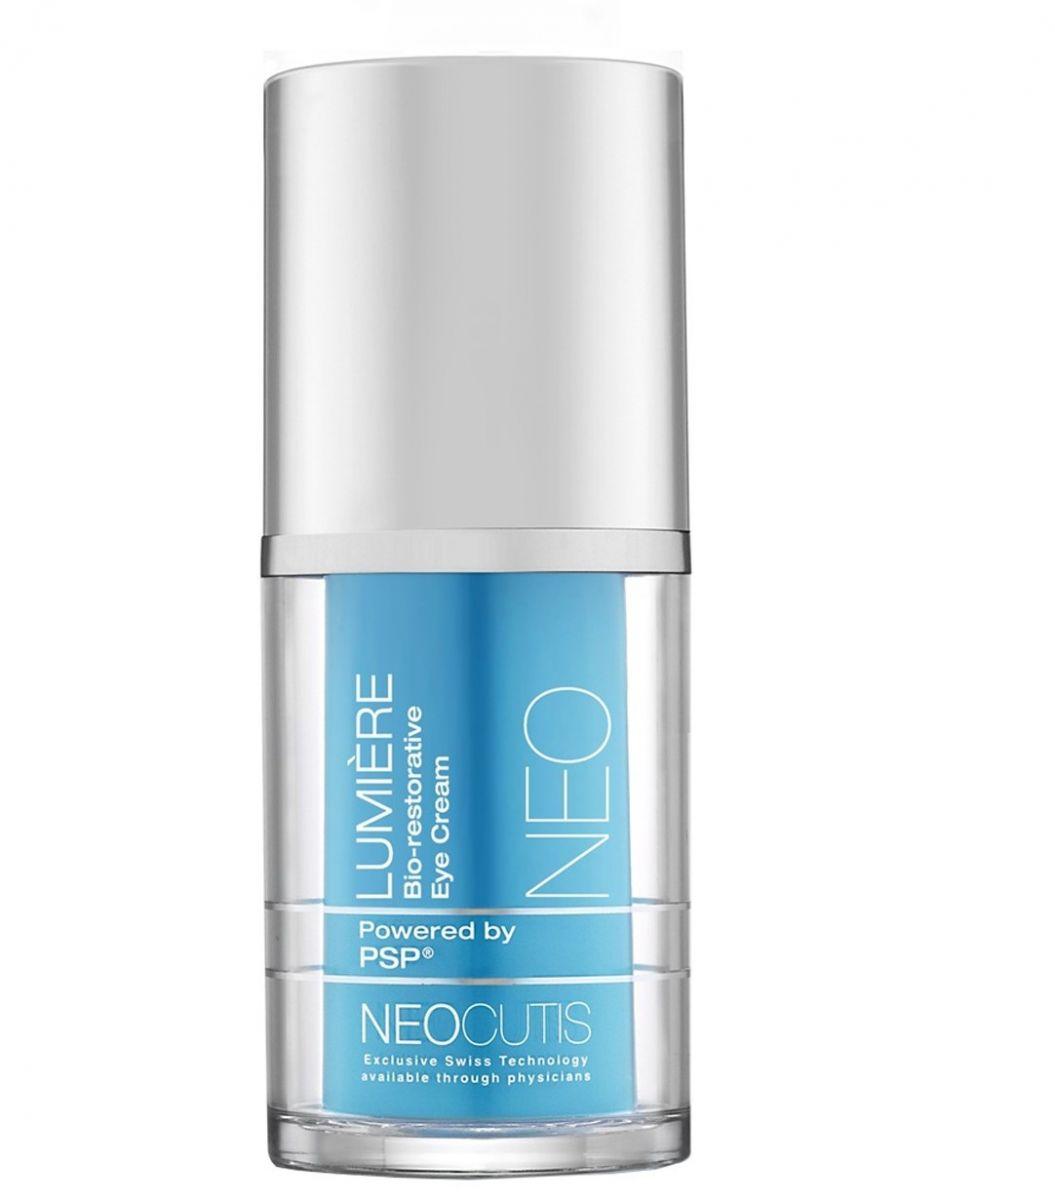 Neocutis Lumiere Bio-restorative Eye Cream with PSP, 51$